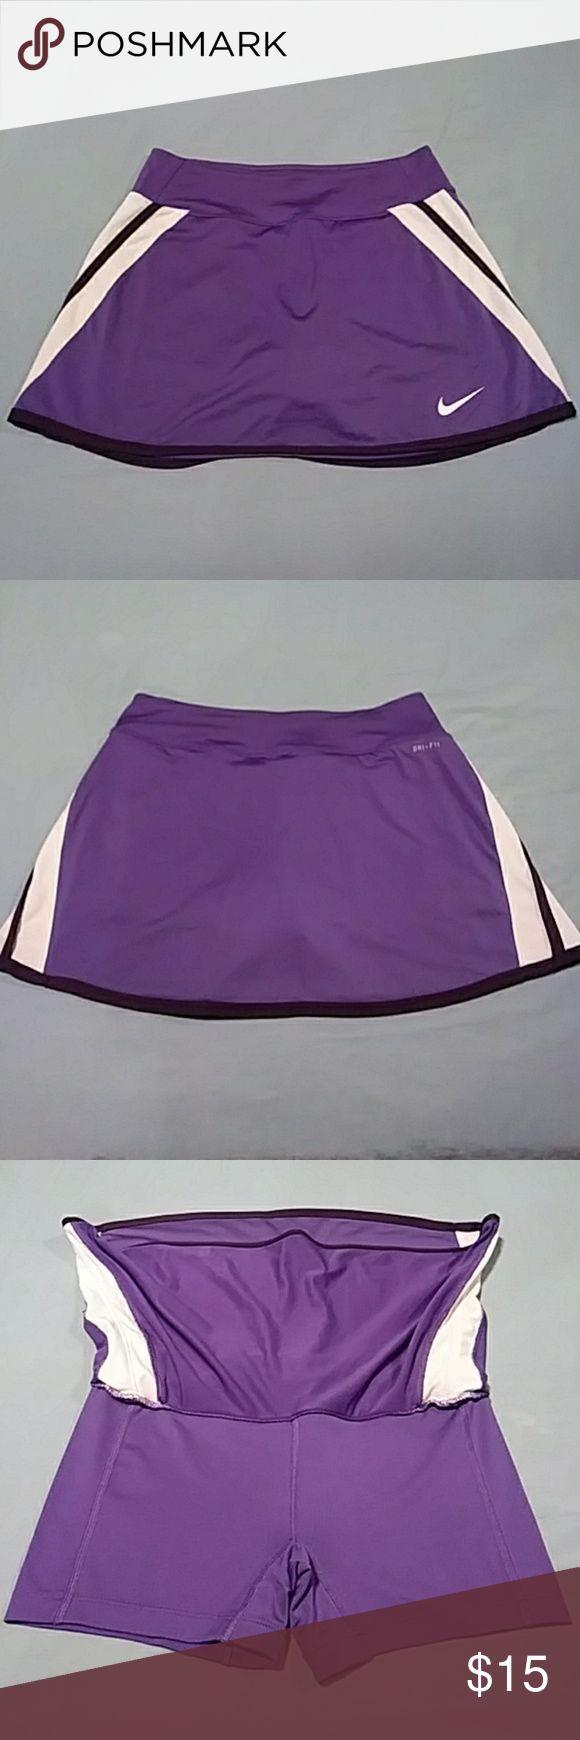 "Nike Dri Fit Skorts NIKE DRI FIT Purple w White Stripes Activewear Skorts Women's Size SMALL (28-30"" Waist) 12.5"" Front & 13"" Back (Waist to Hem) 87% Polyester * 13% Spandex Shorts - 3.5"" Inseam 92% Polyester * 8% Spandex Nike Shorts Skorts"